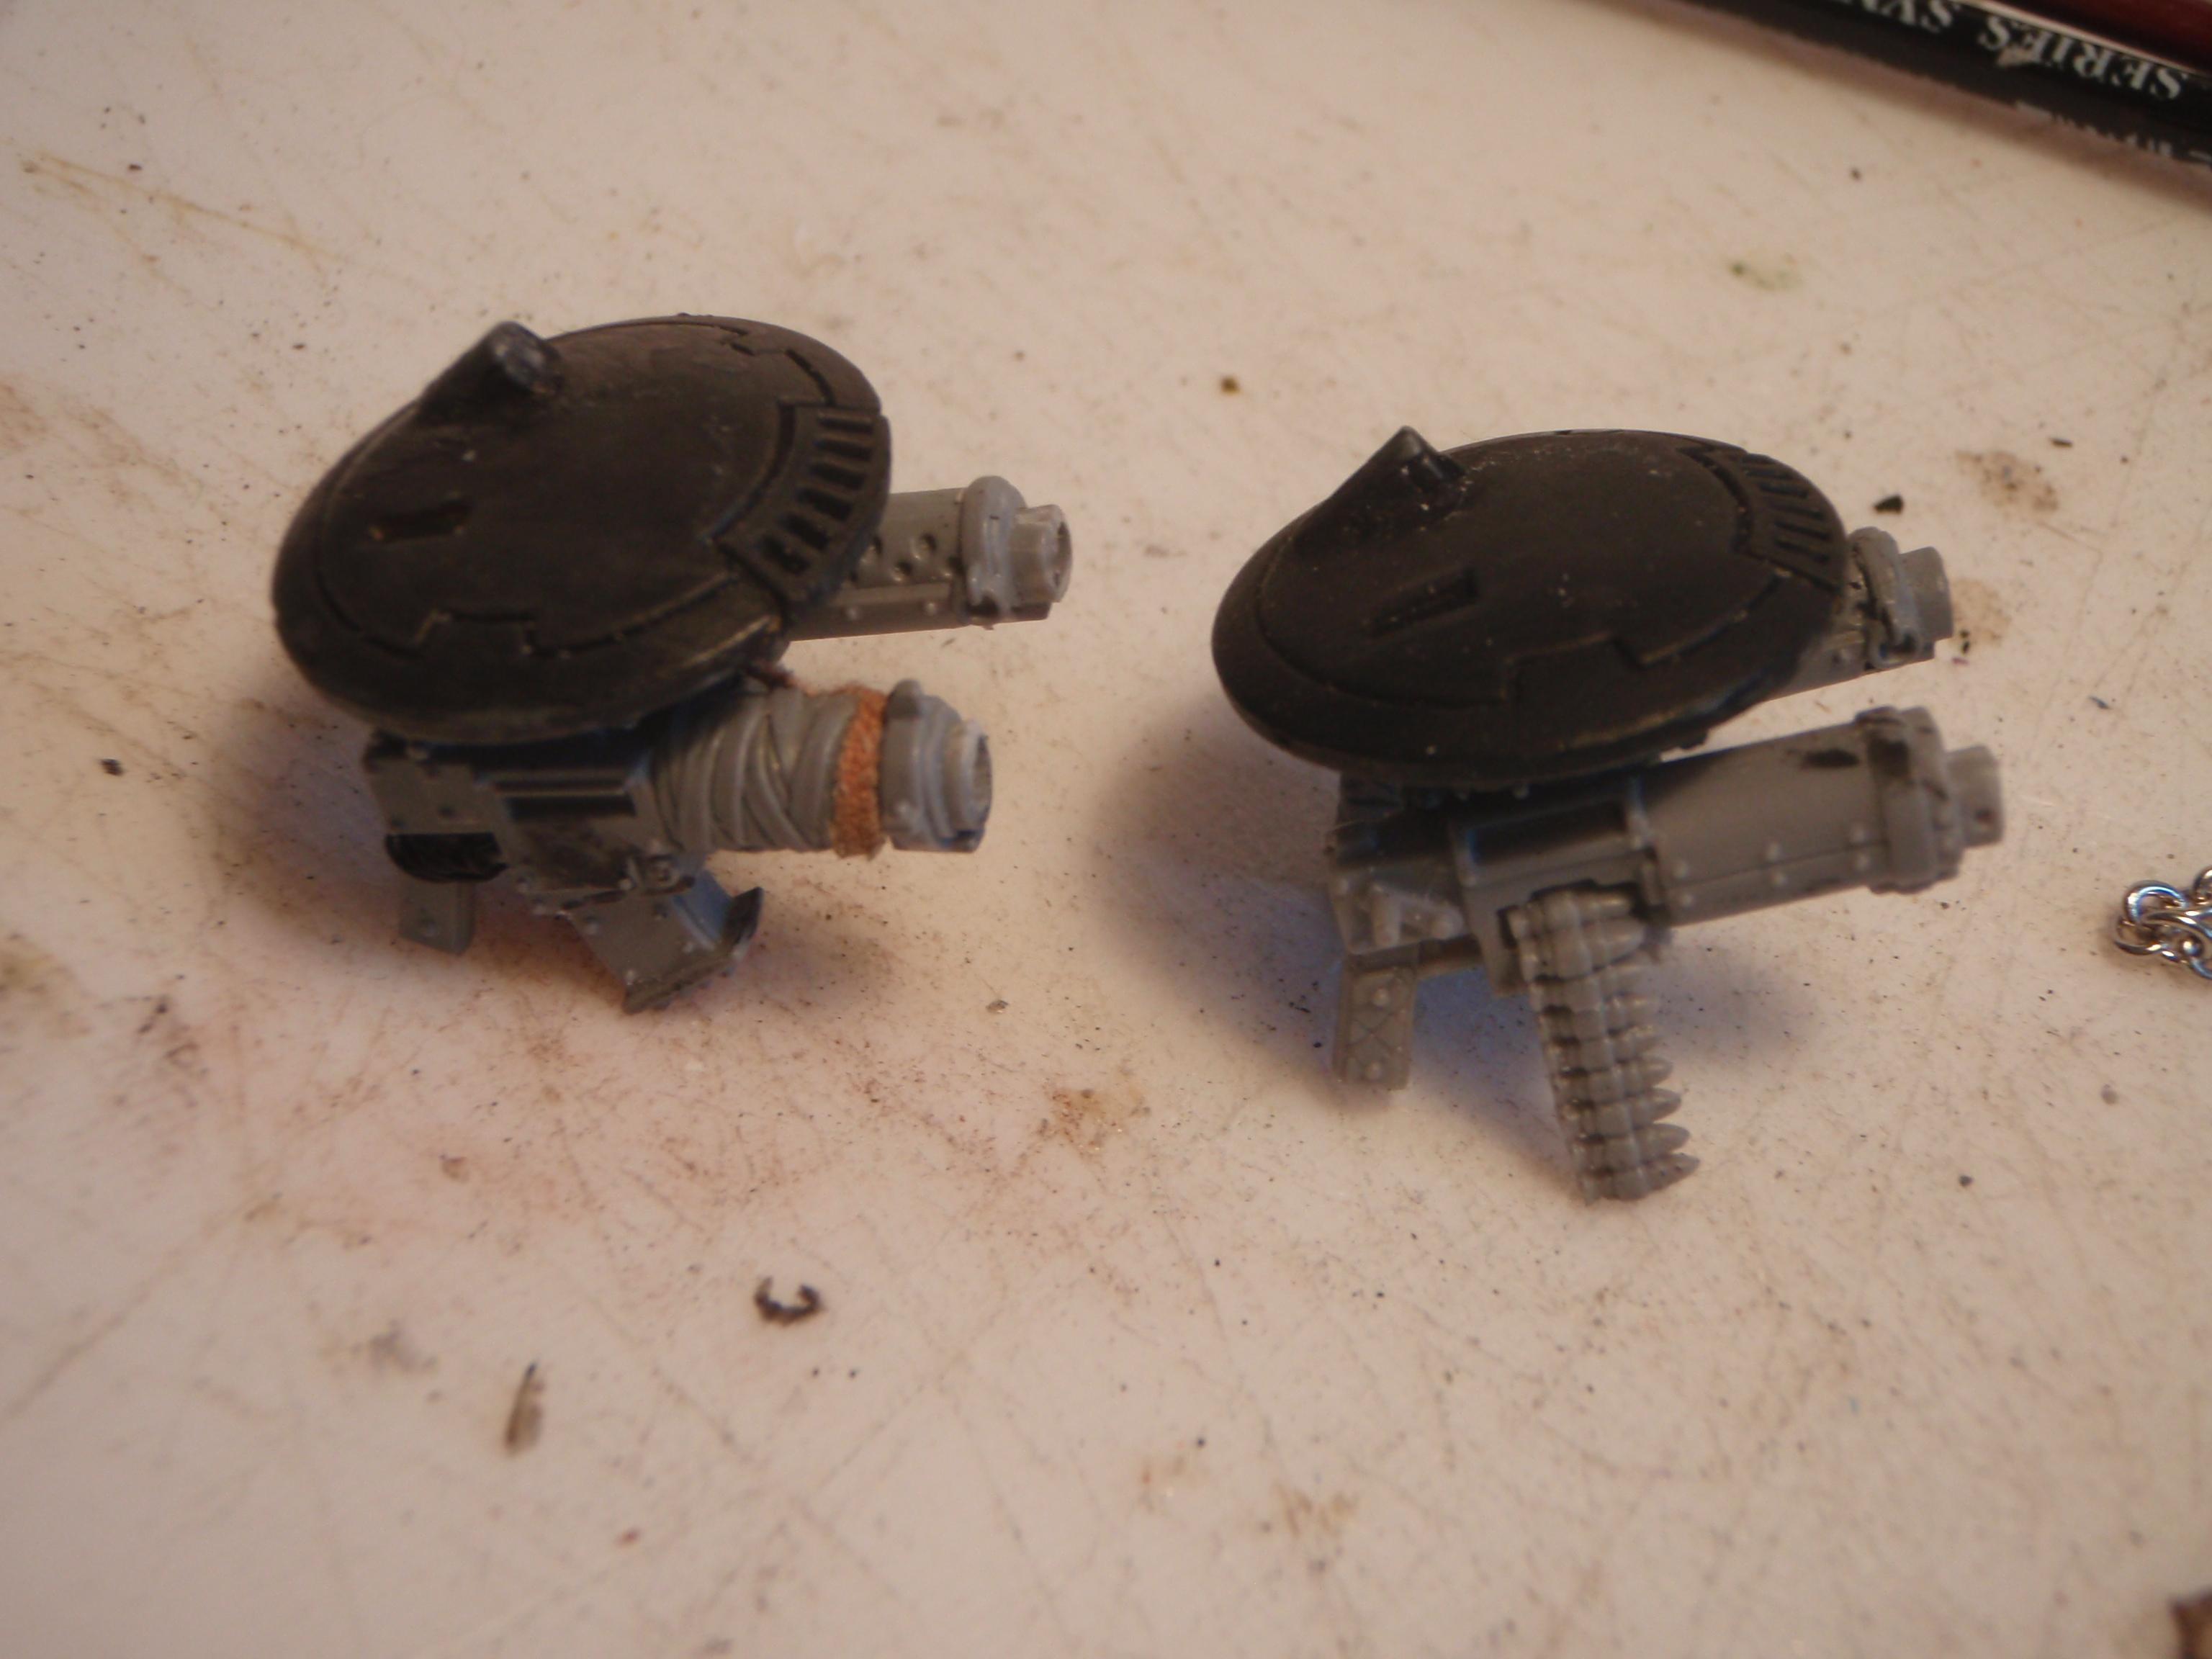 Ork Tau Flyer guns